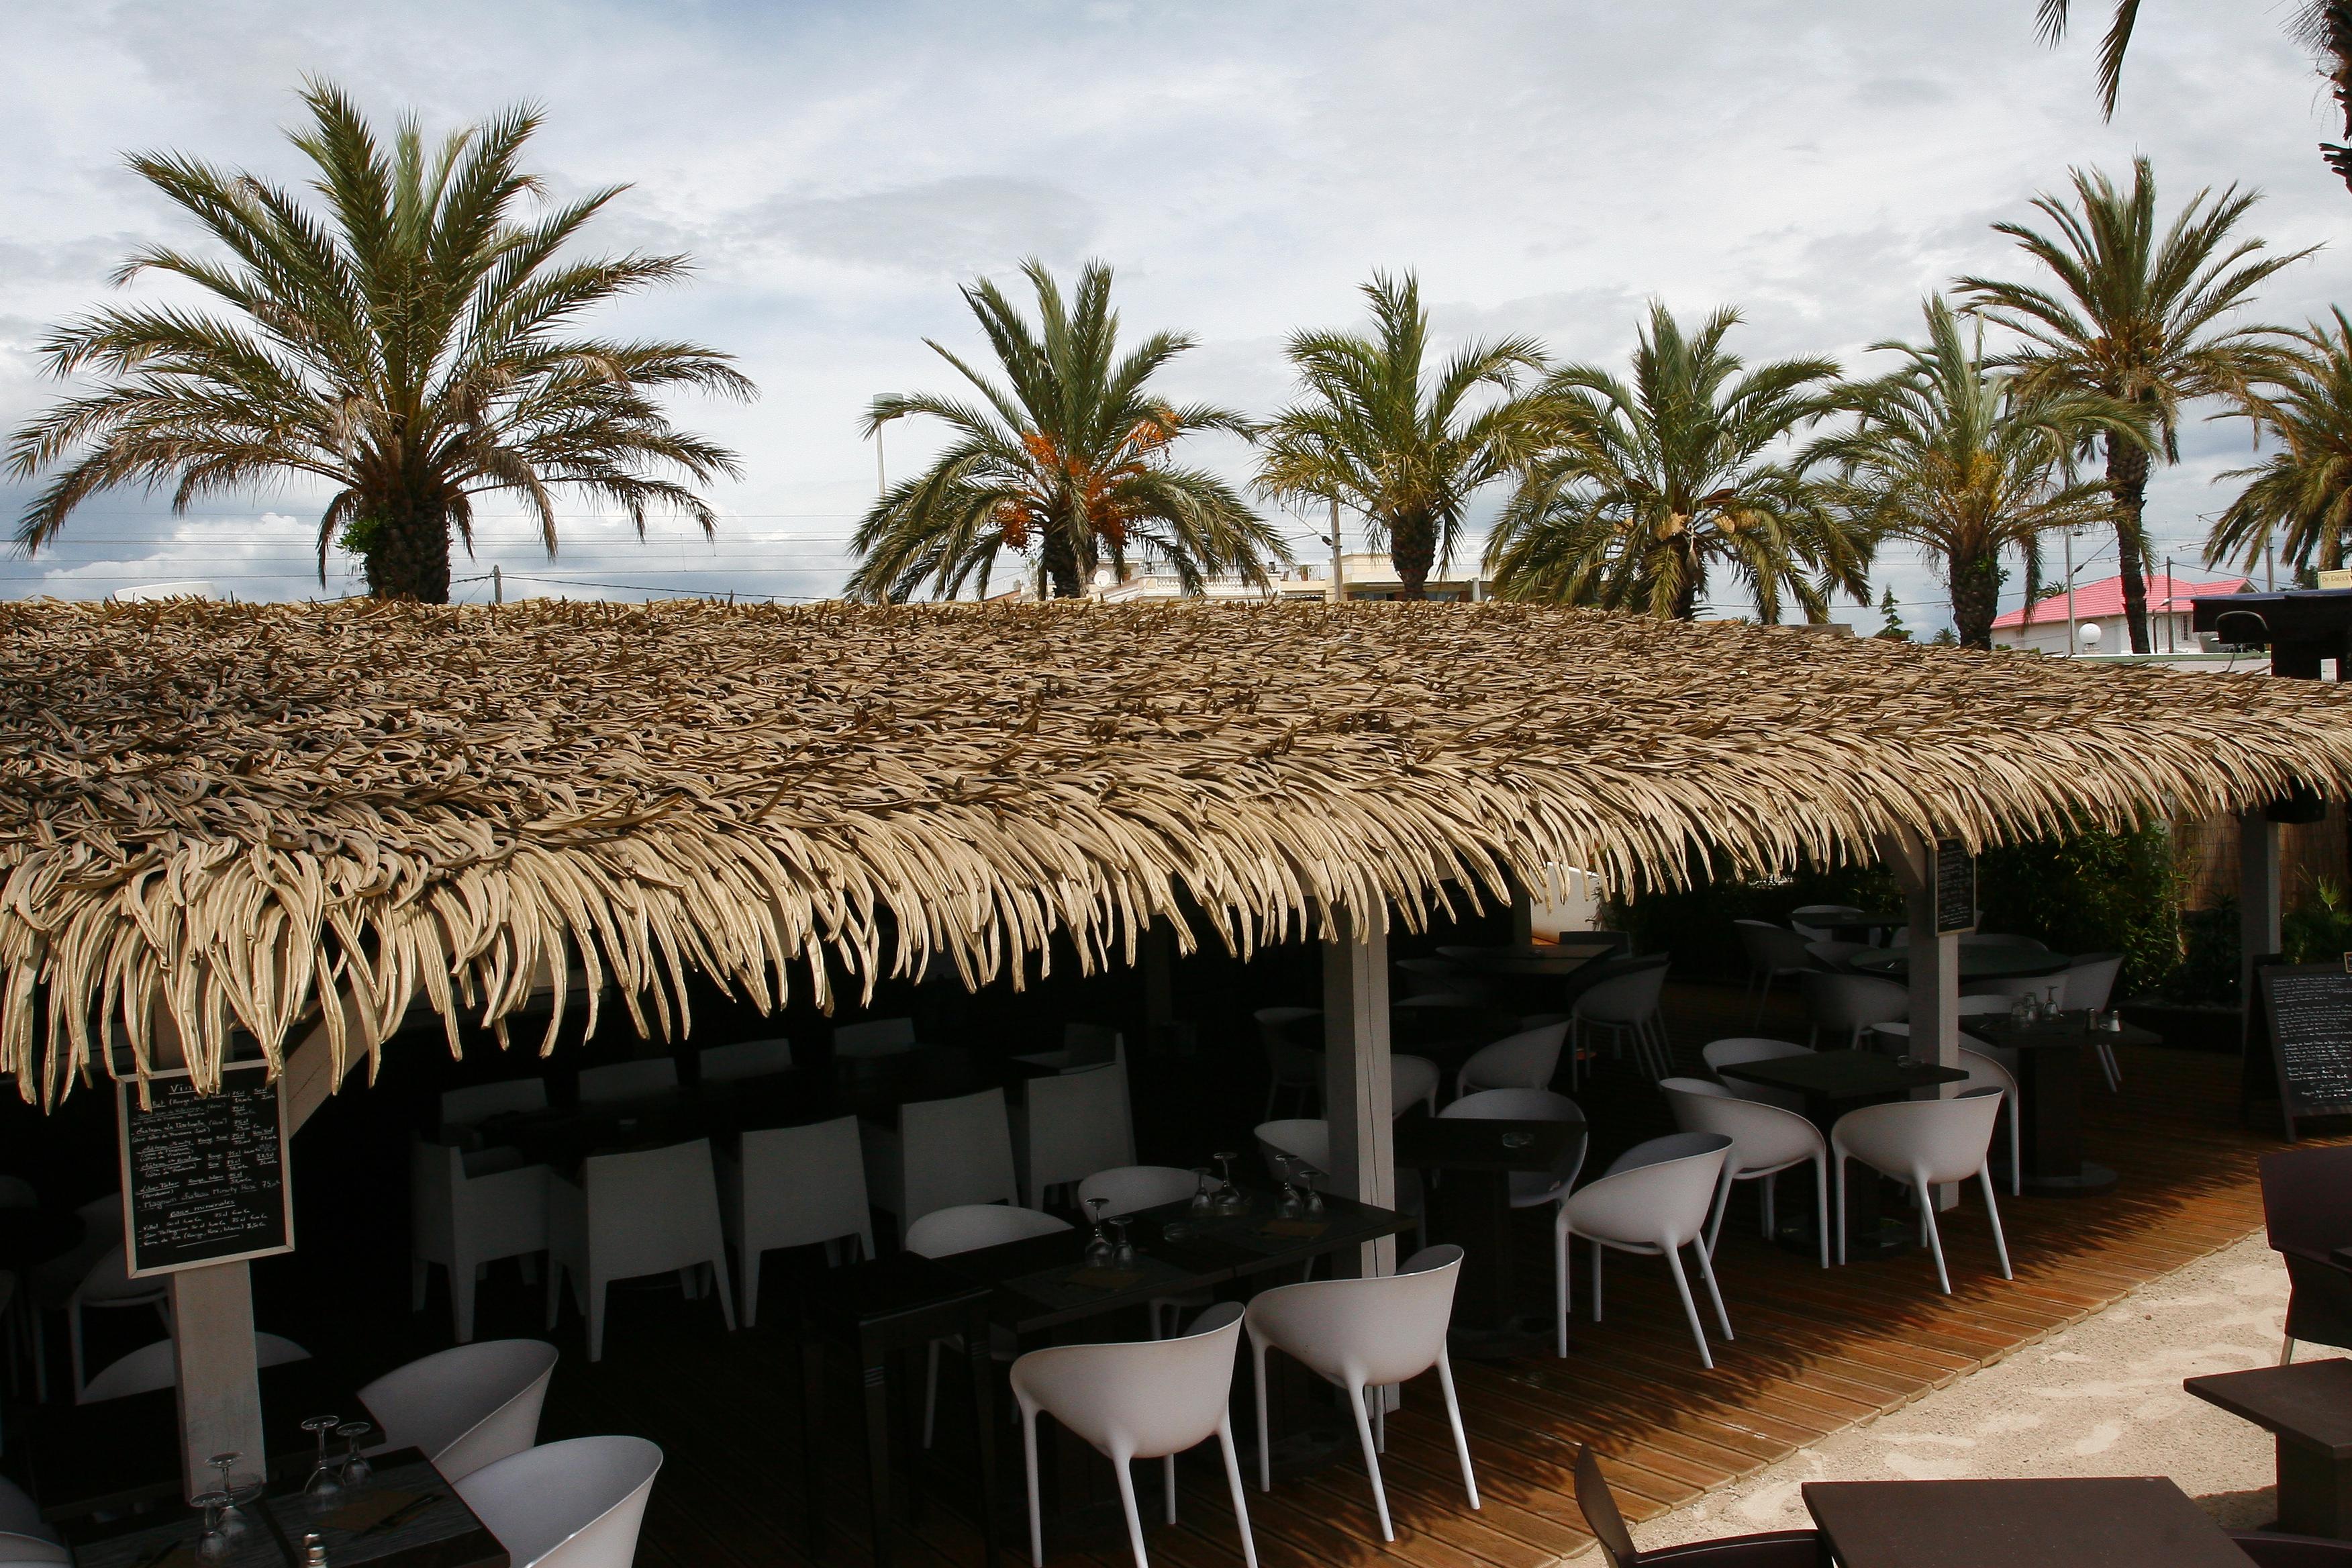 Restaurant Tiki Canopy